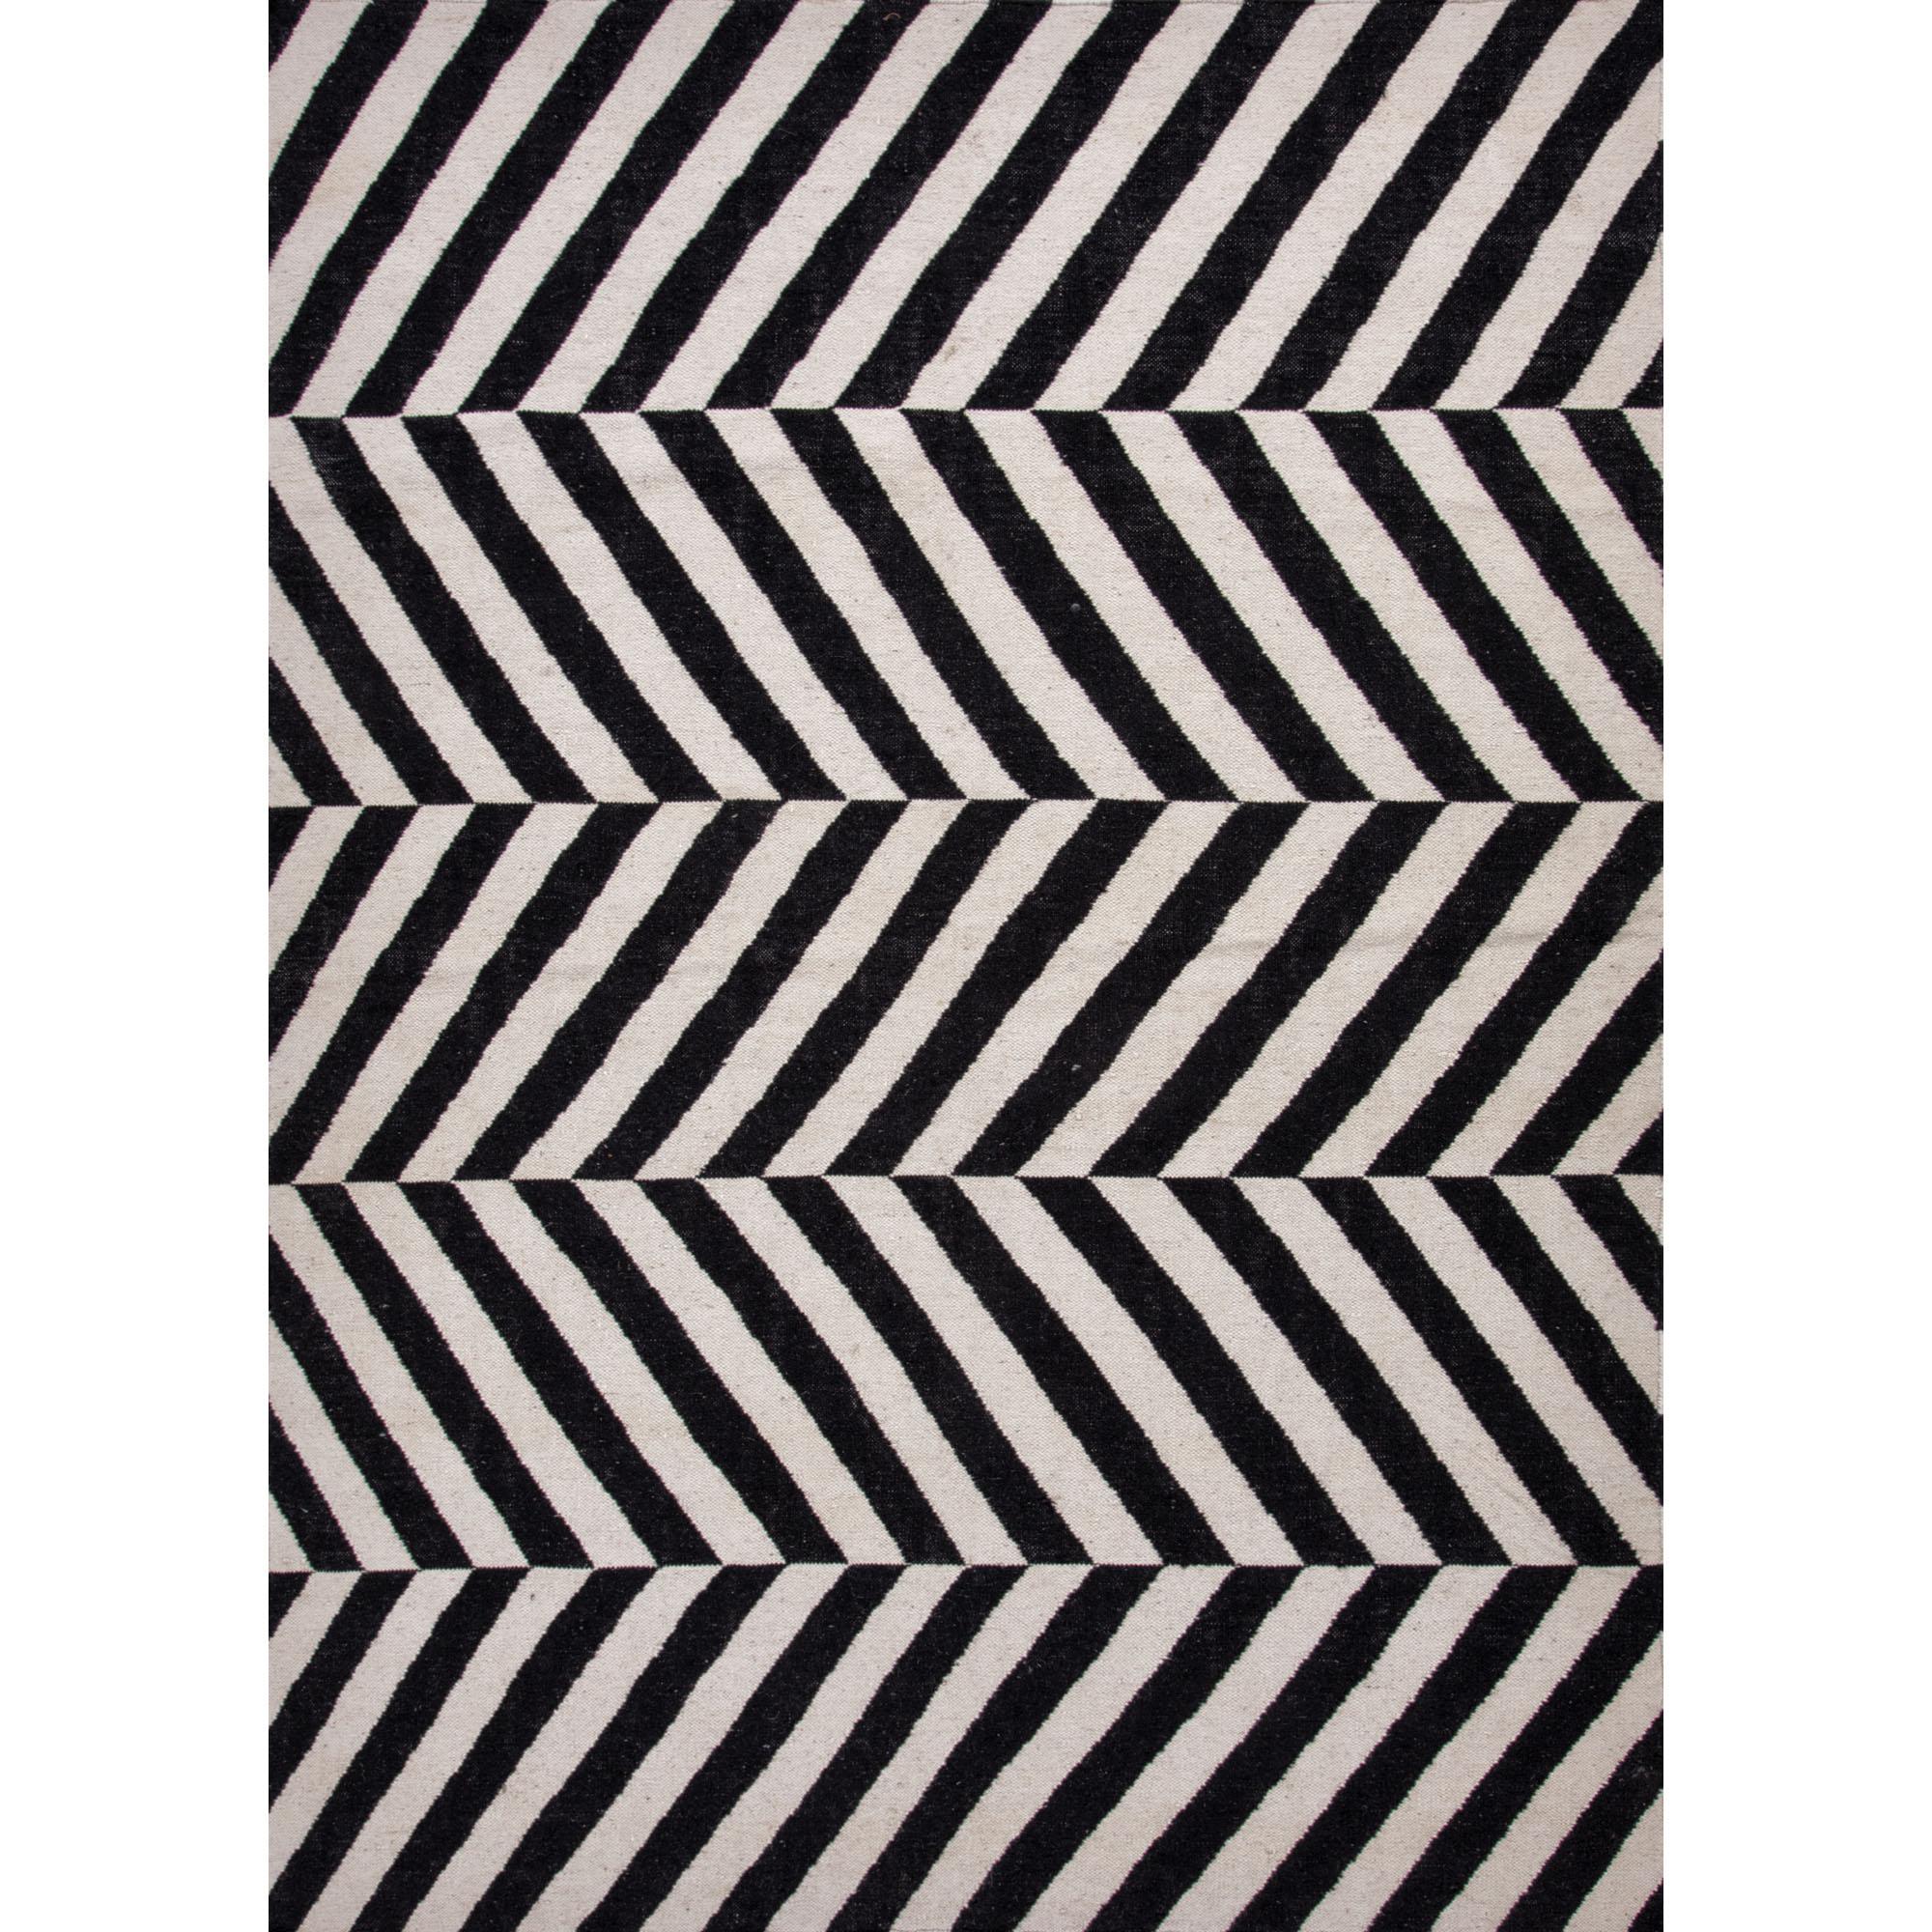 Maroc 5 x 8 Rug by JAIPUR Rugs at Sprintz Furniture